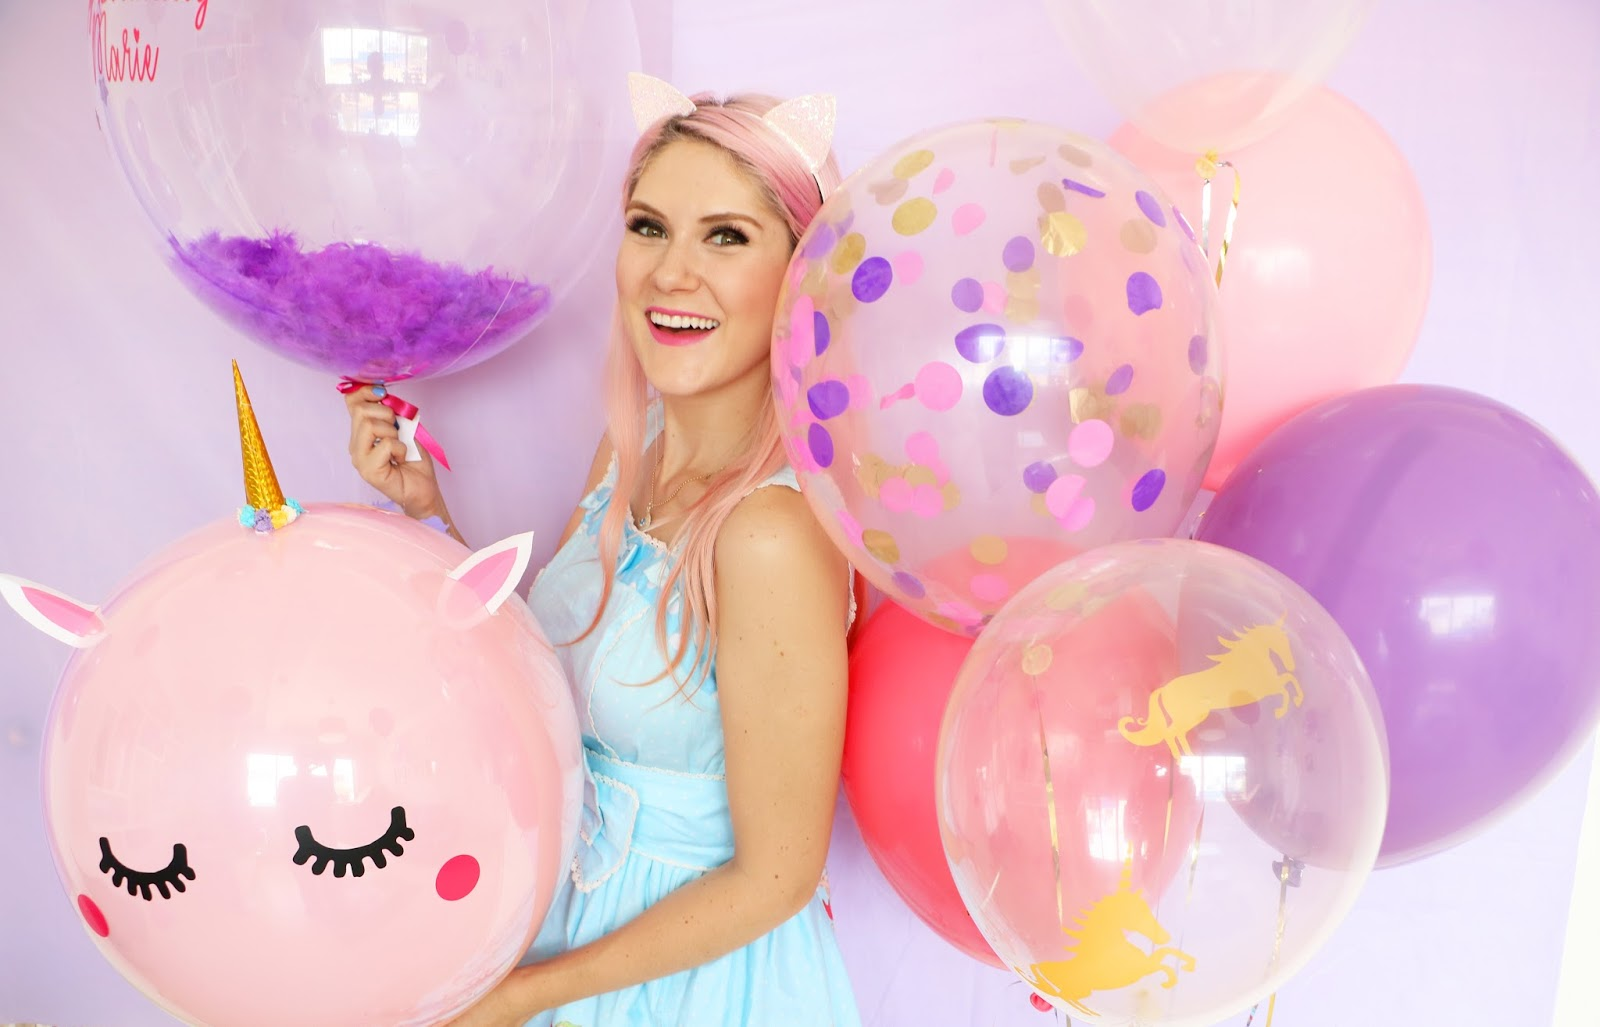 Adorable Pastel Unicorn Balloons